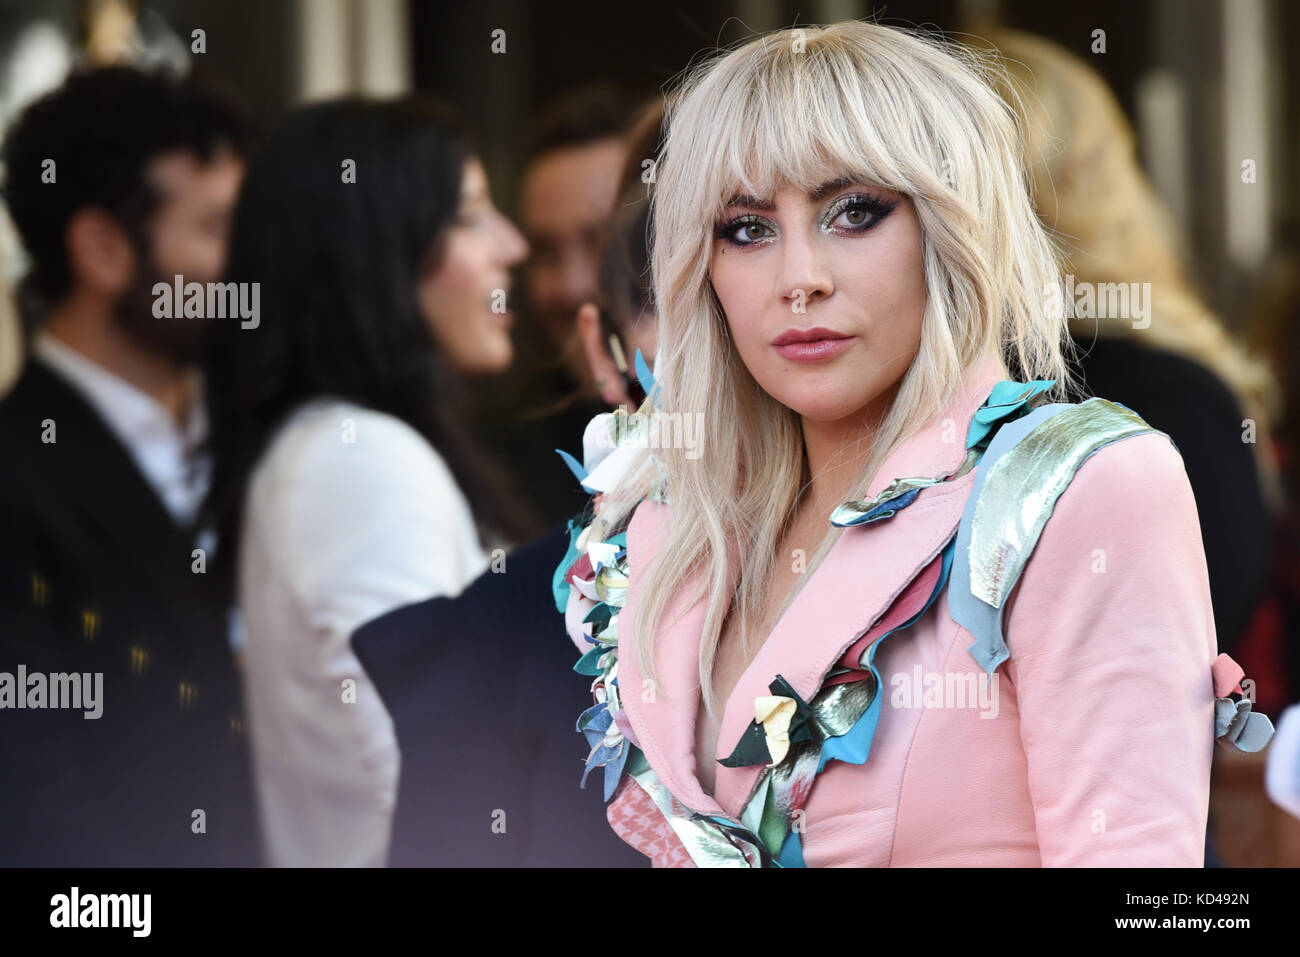 42 Toronto International Film Festival - lady gaga Fotoshooting mit: Lady Gaga wo: Toronto, Kanada, wenn: 08 Sep Stockbild